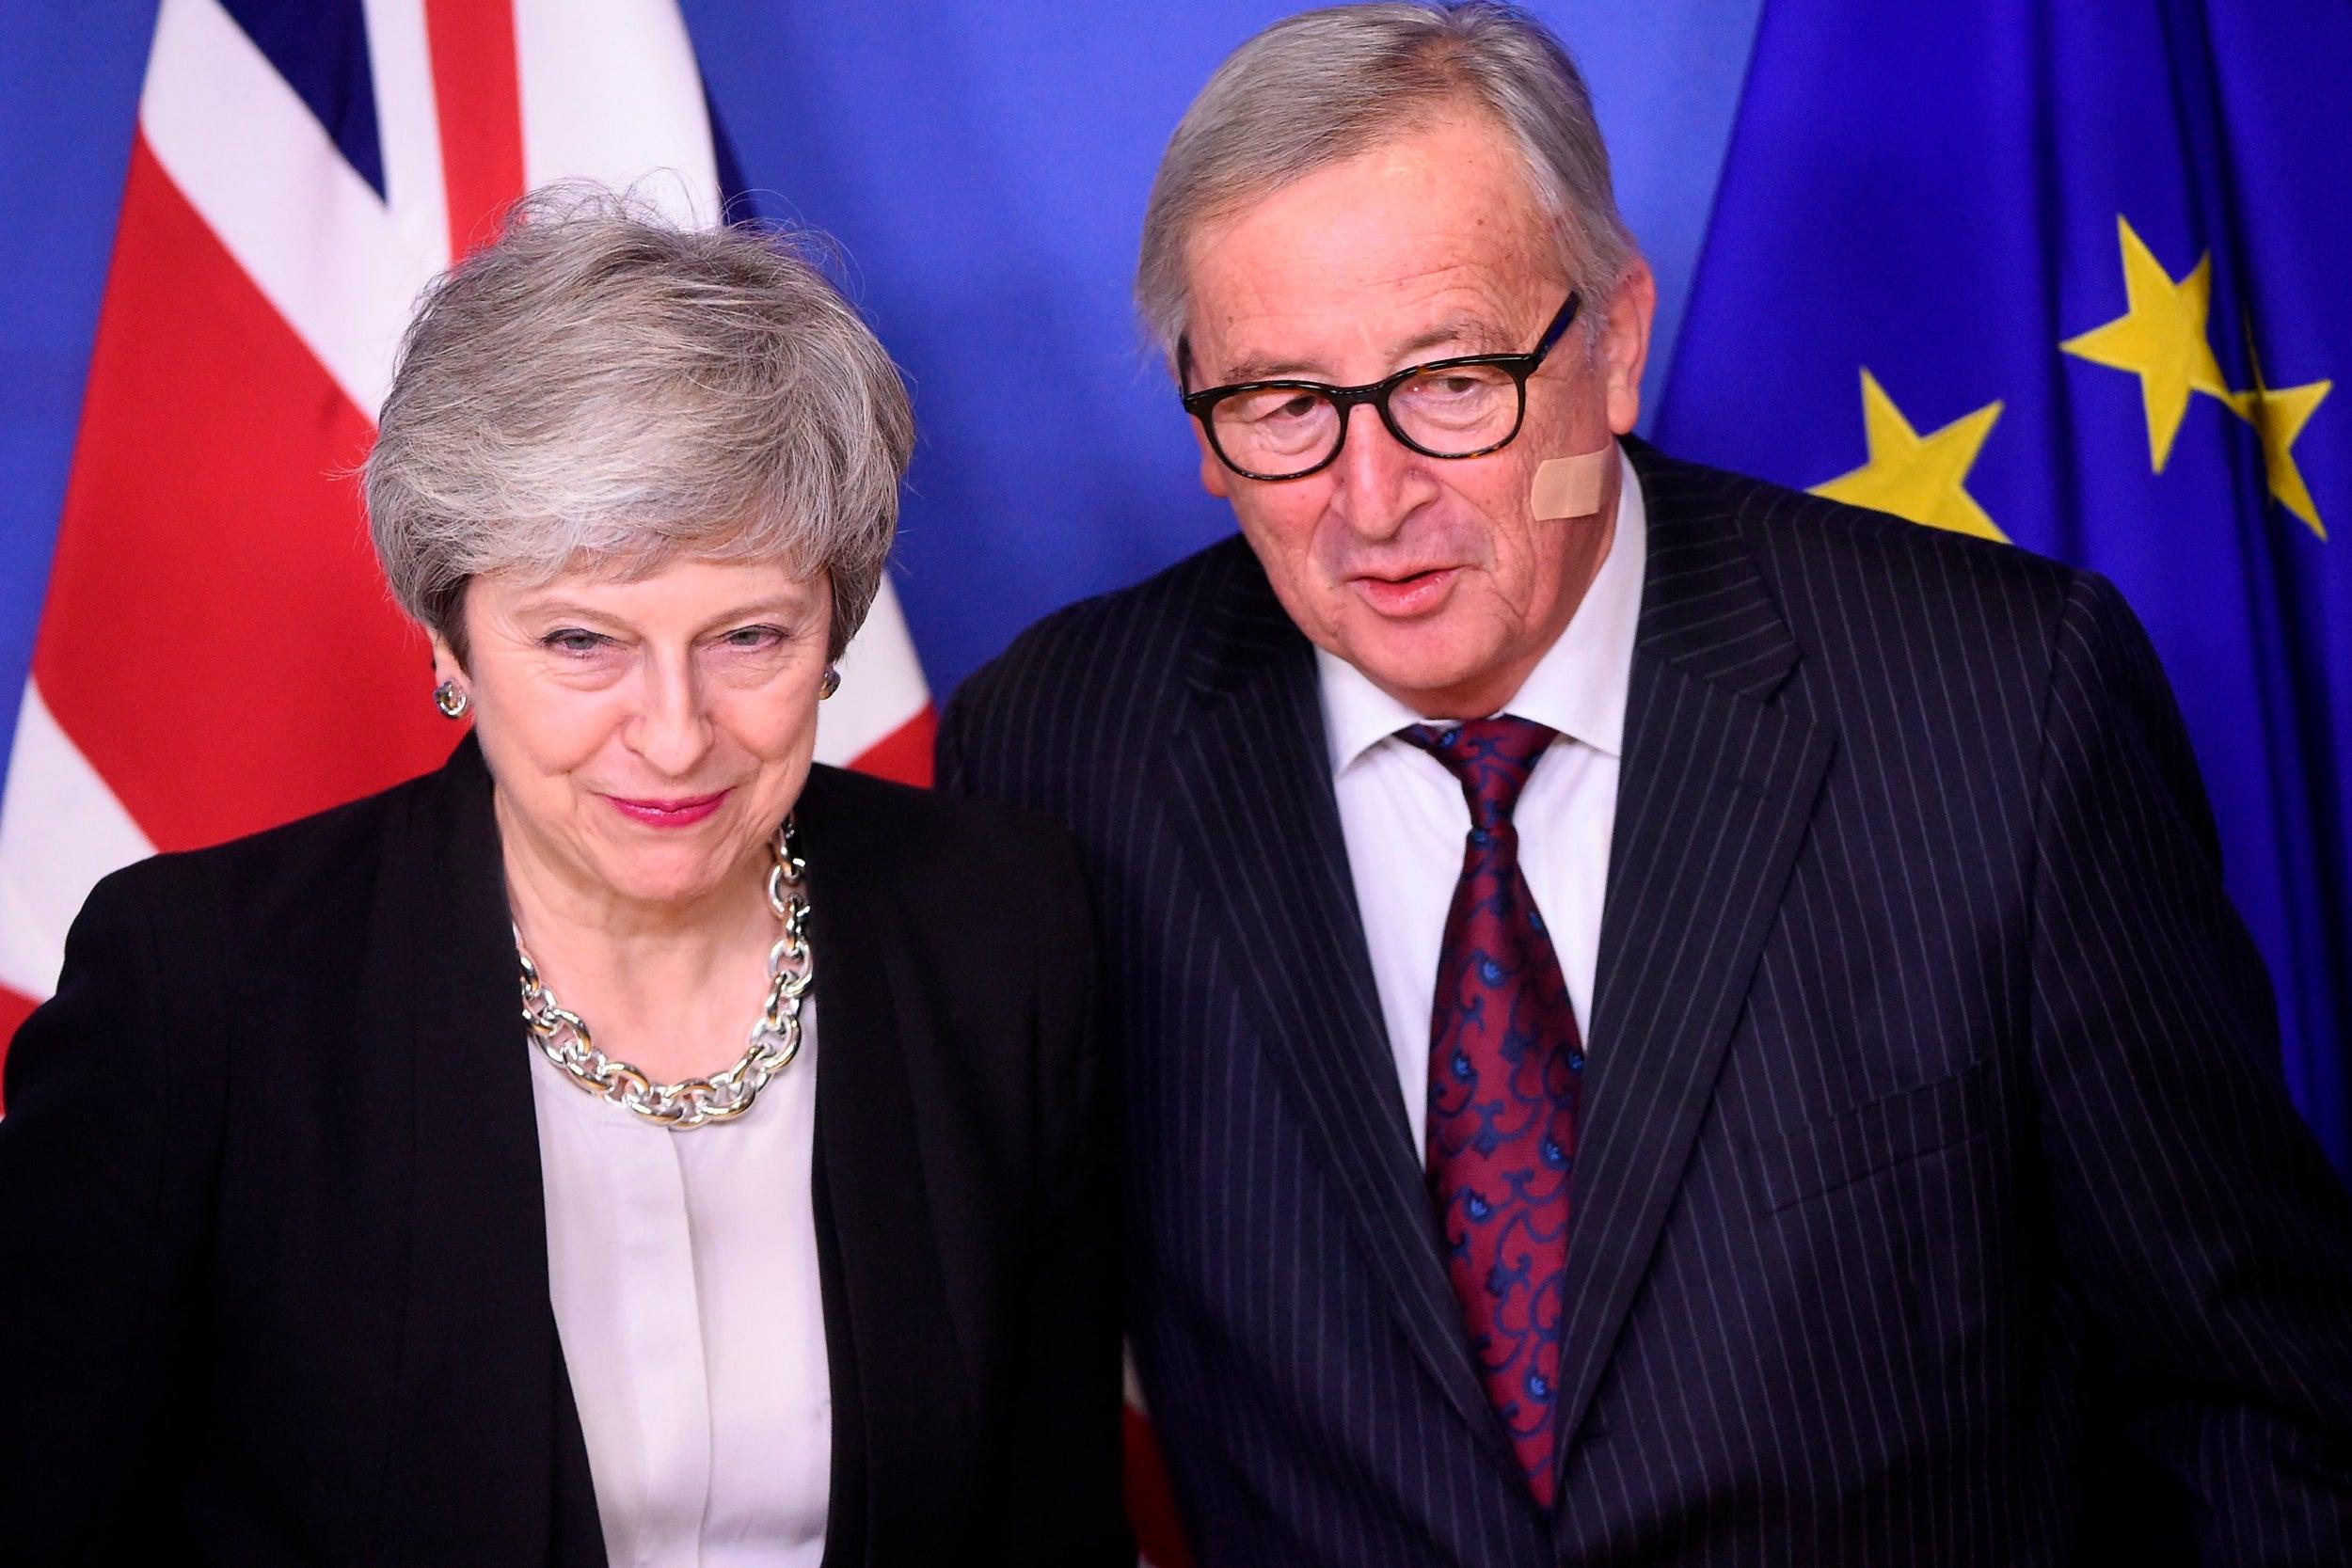 We've upset Japan, China and Bangladesh this week alone – post-Brexit Britain won't have any trade links at this rate